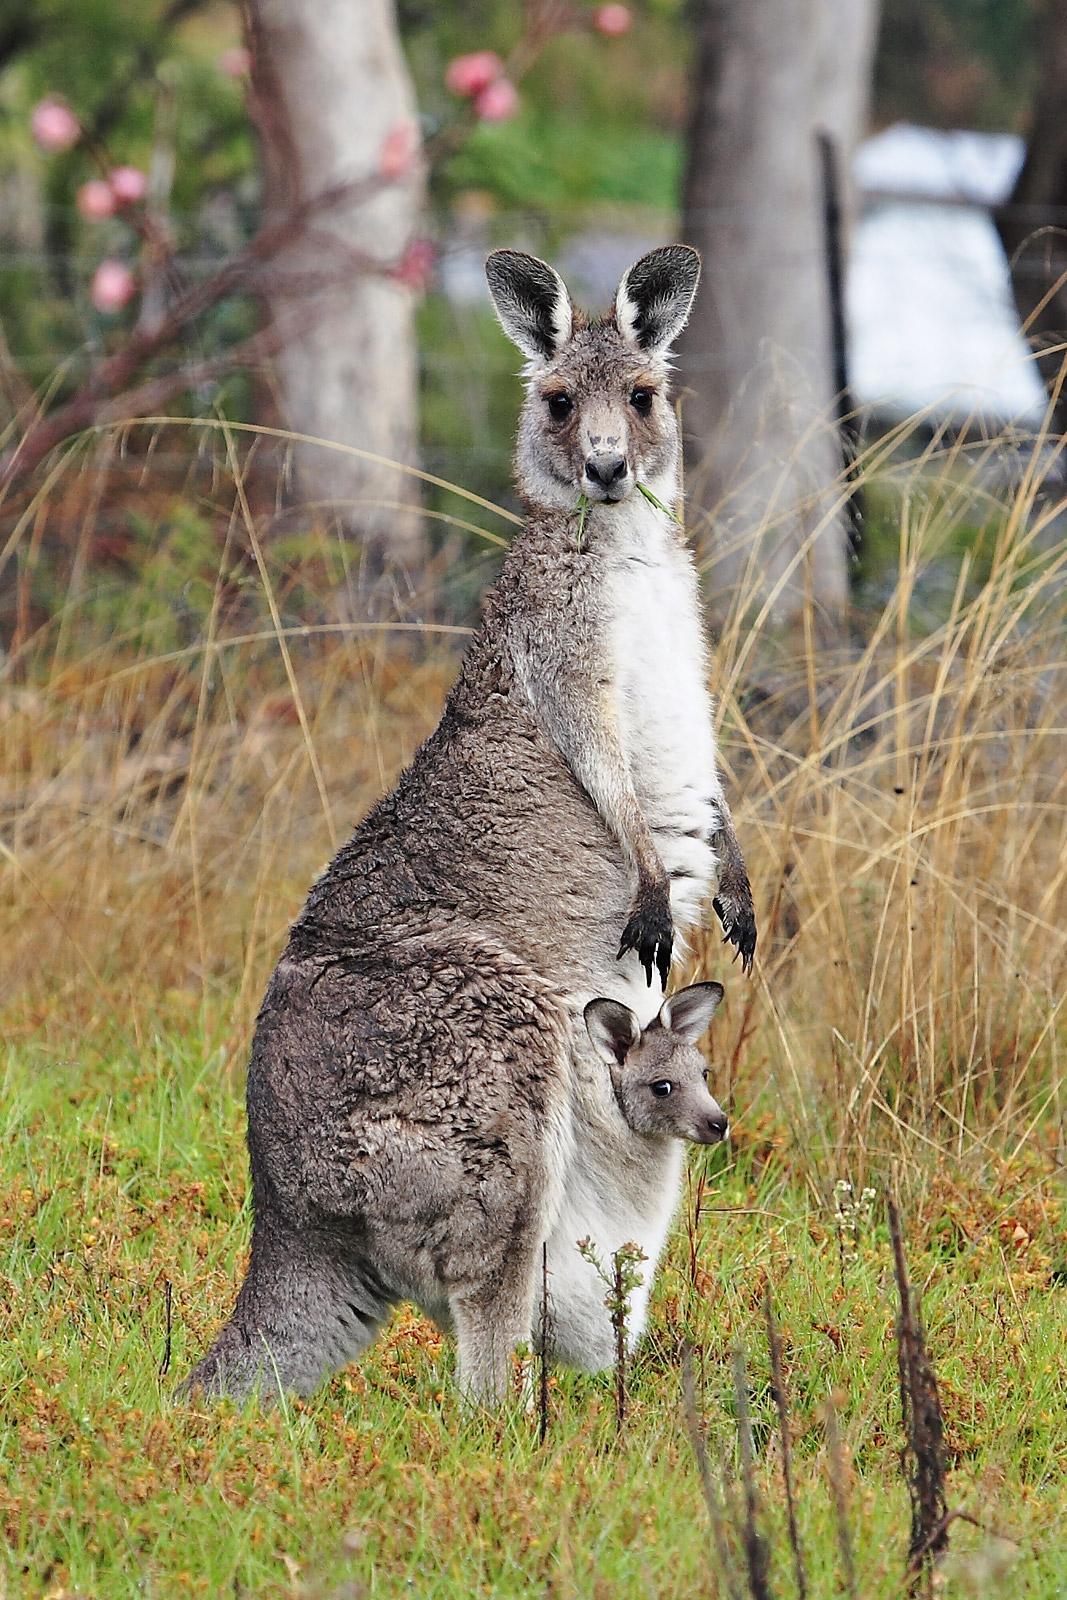 australian kangaroo, image